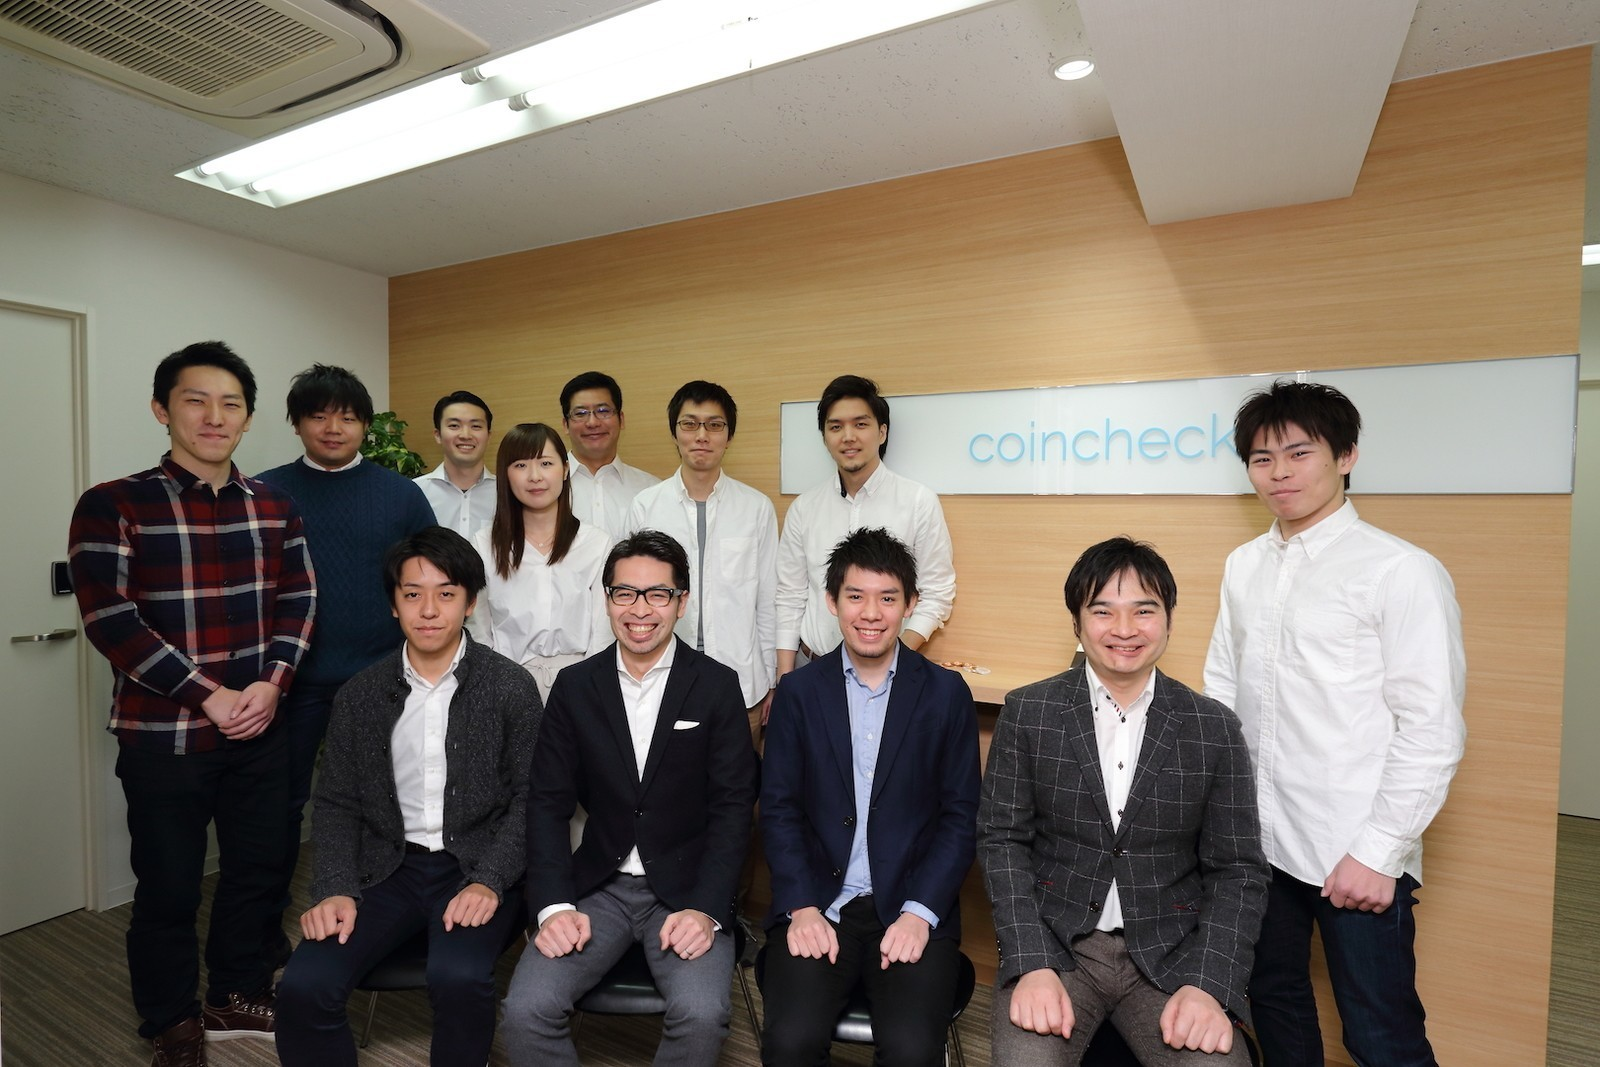 Fintechの最前線!仮想通貨取引所「Coincheck」を開発するRailsエンジニア募集!